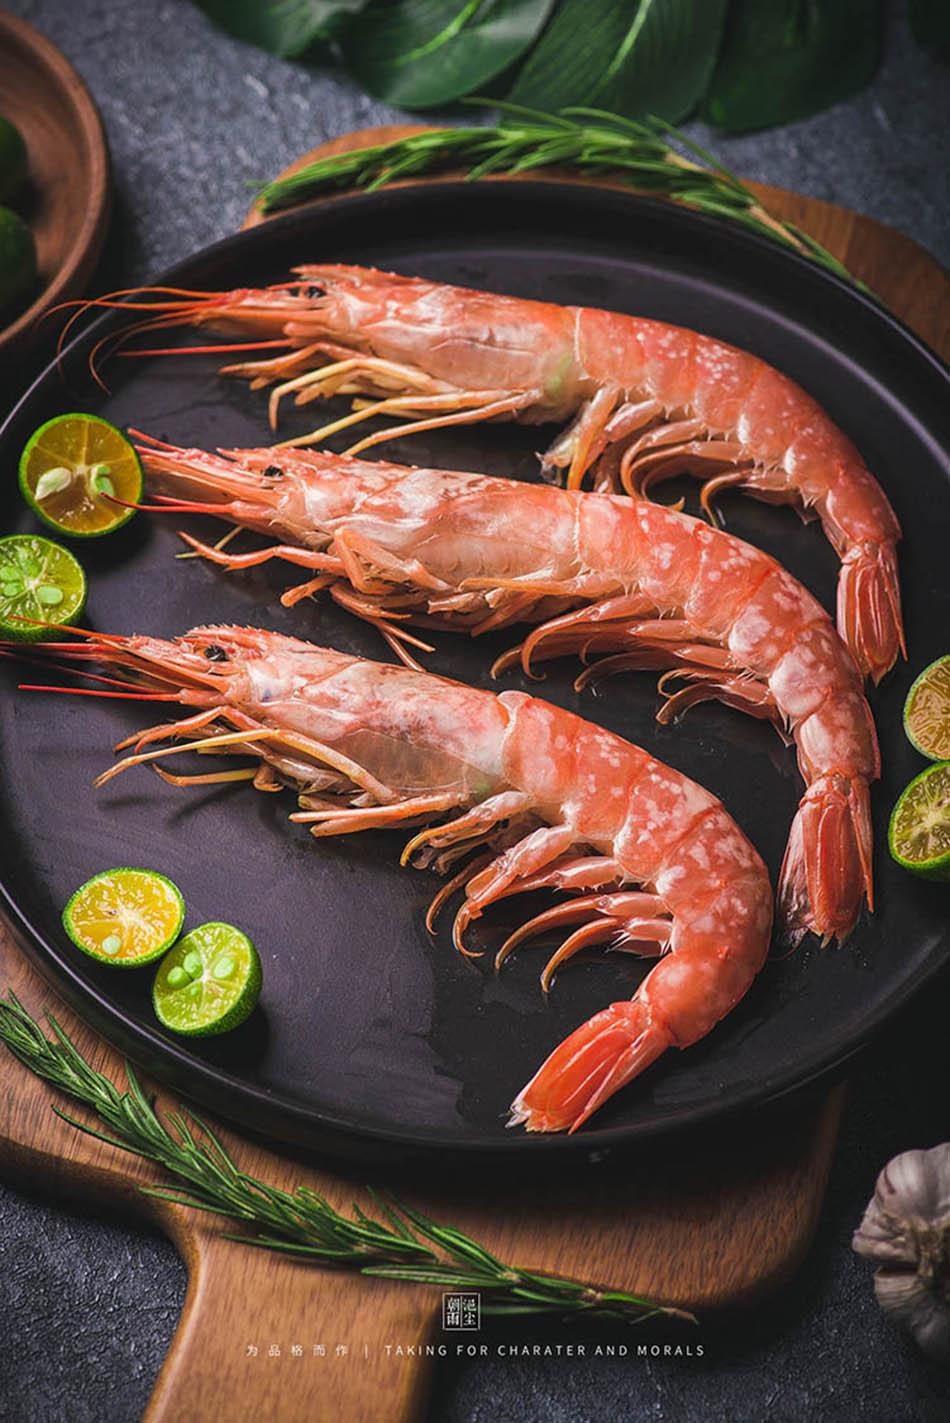 食品摄影-大白虾2